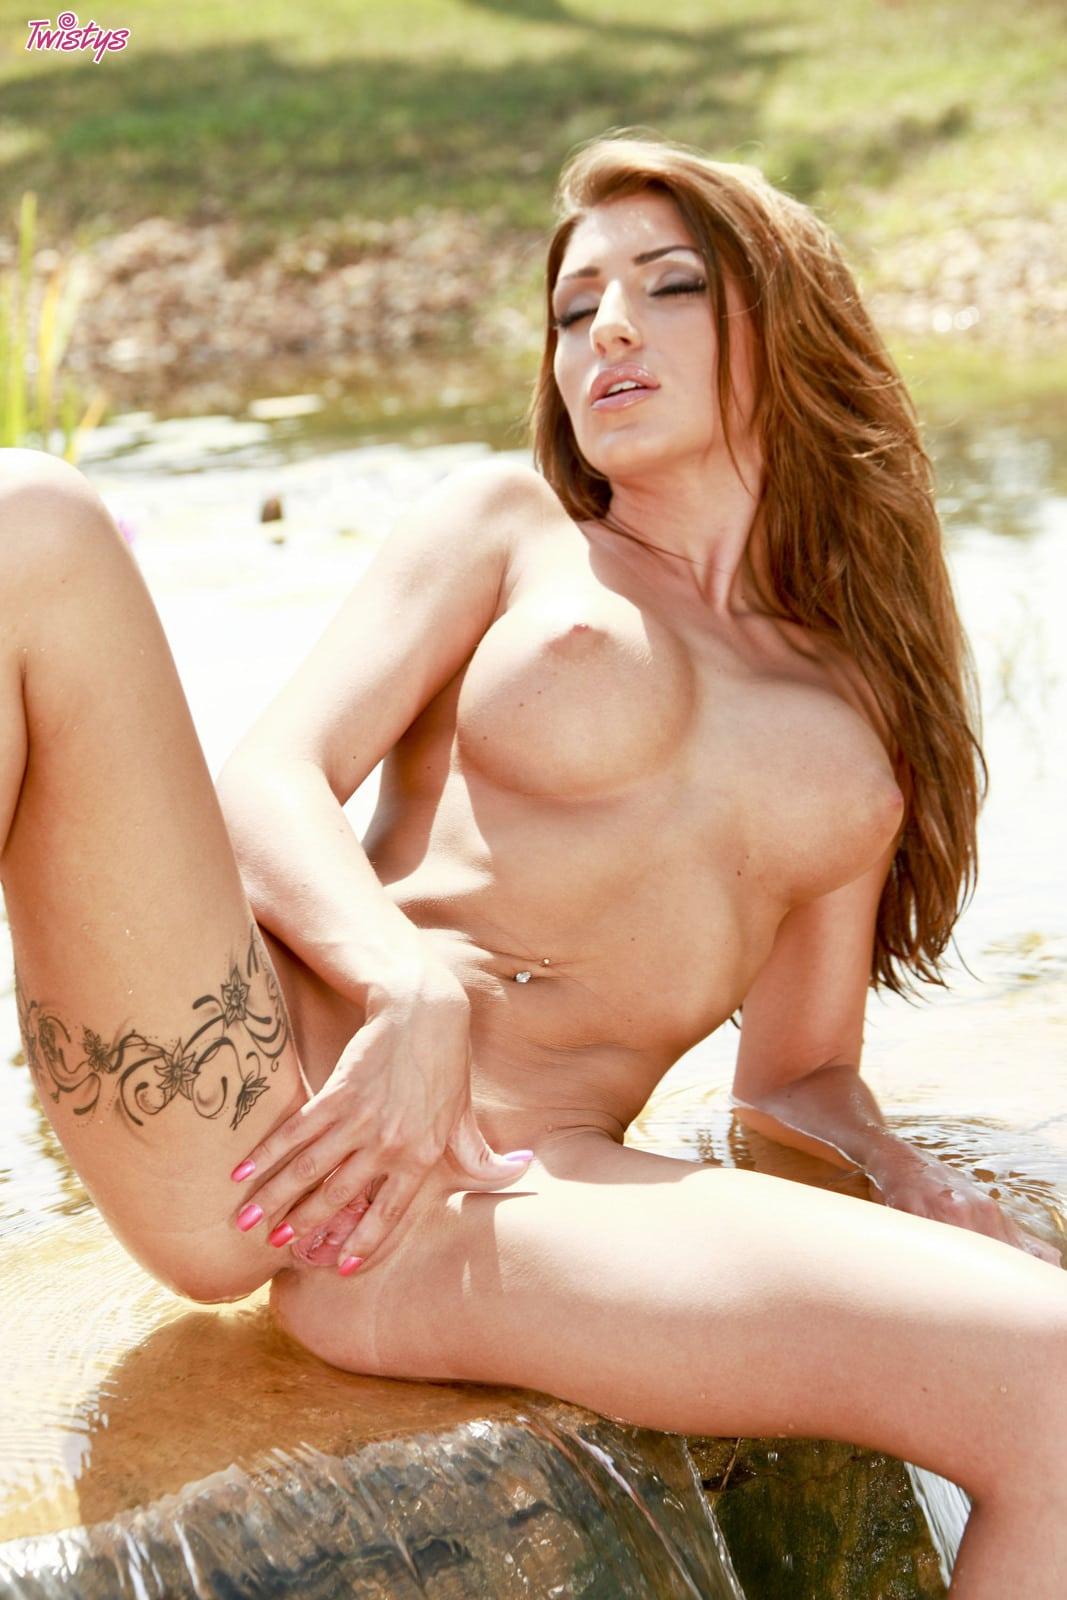 Hooters model nude